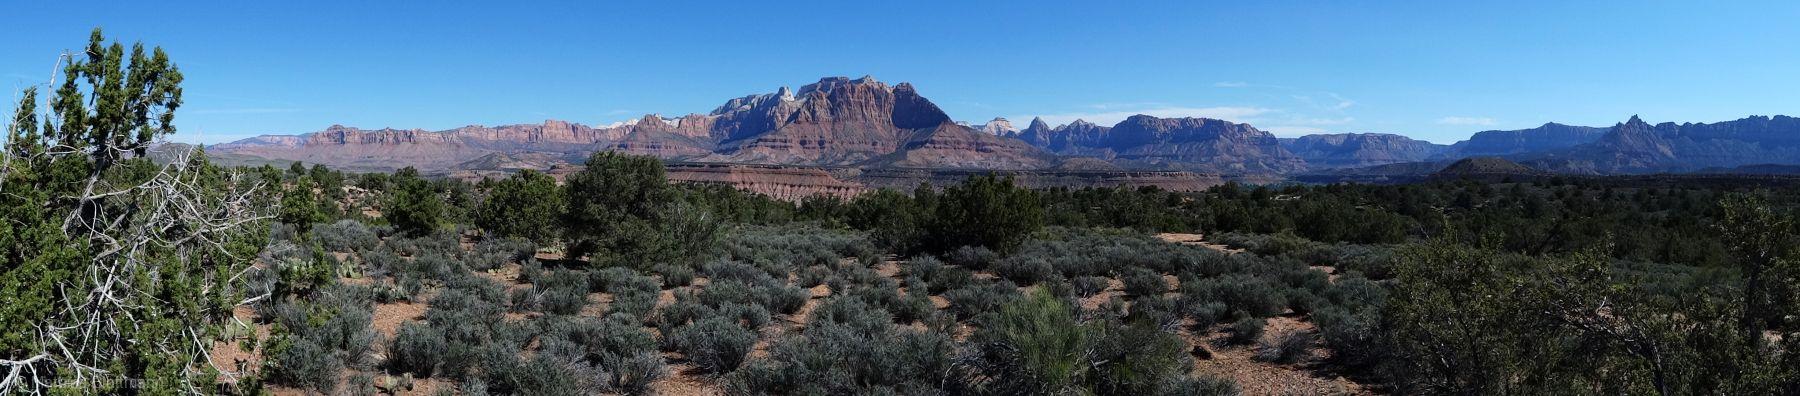 Nature-Park-Panorama